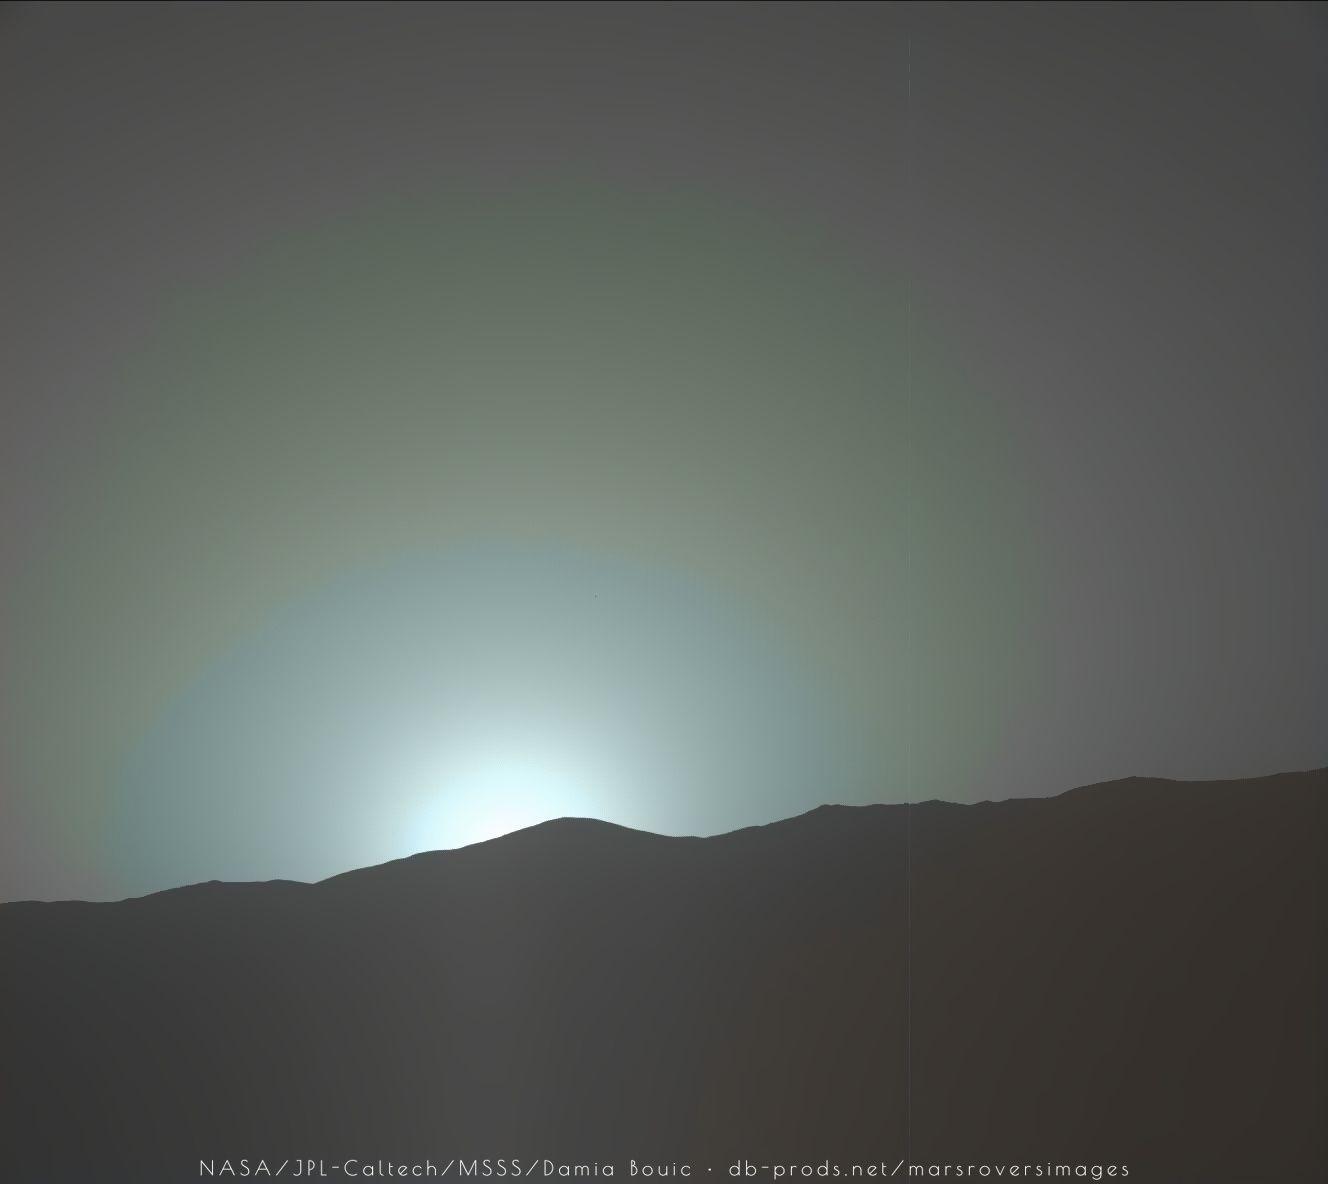 11_29_mars_curiosity_sunset